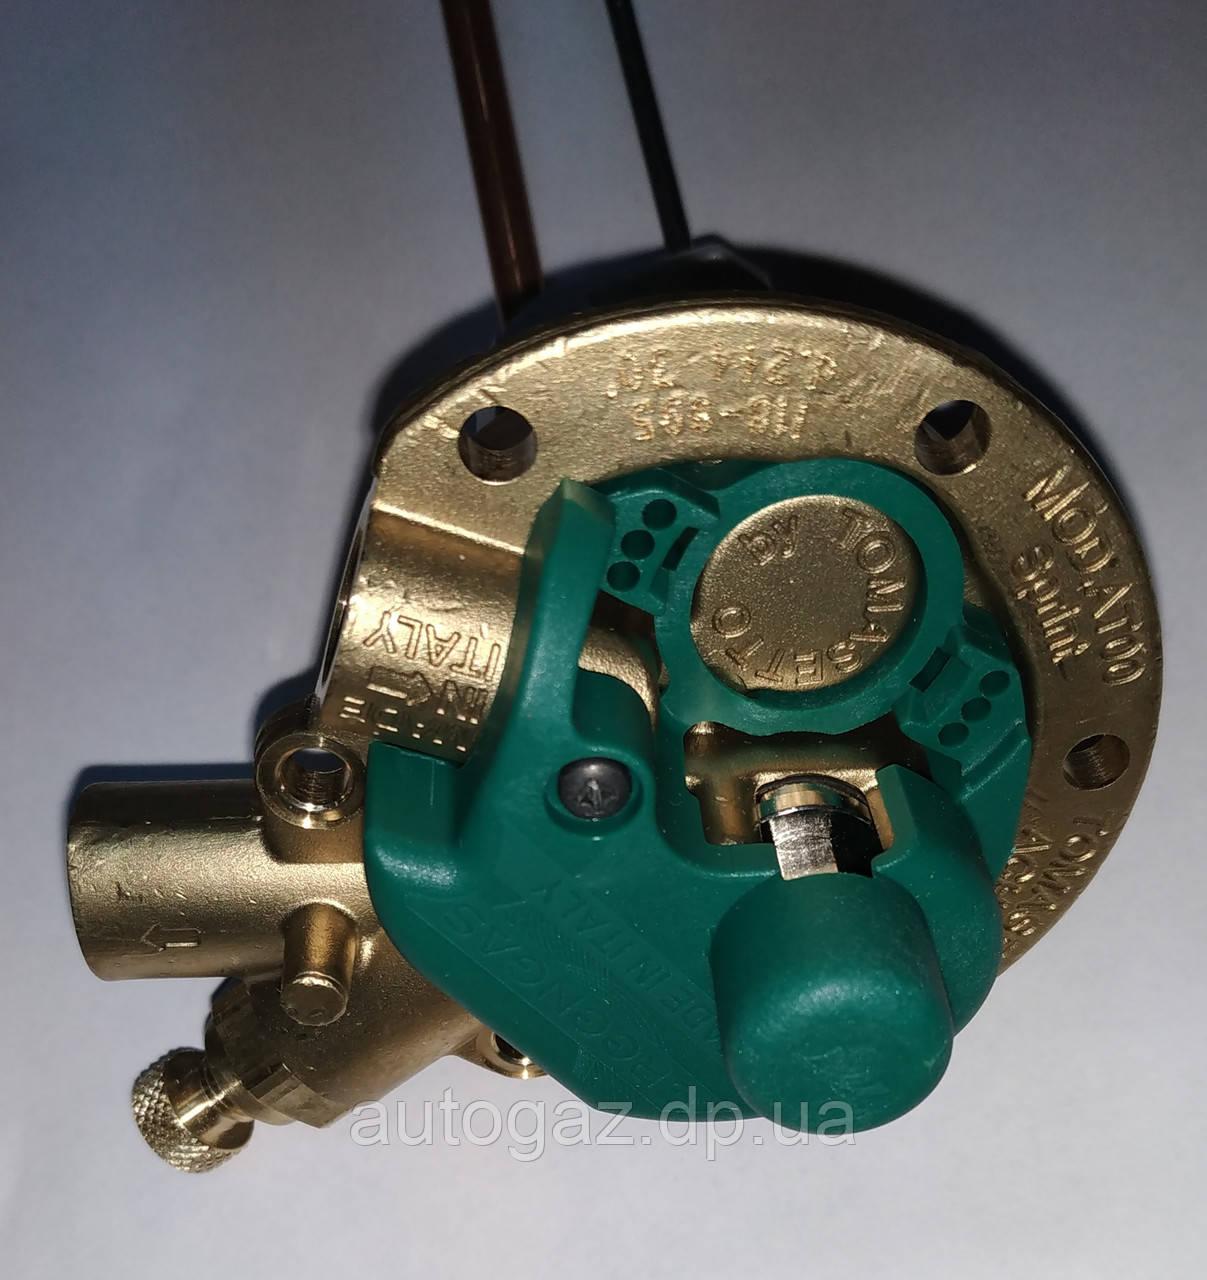 Мультиклапан Tomasetto АТ00 R67-00 D315-30, кл.A, (шт.)